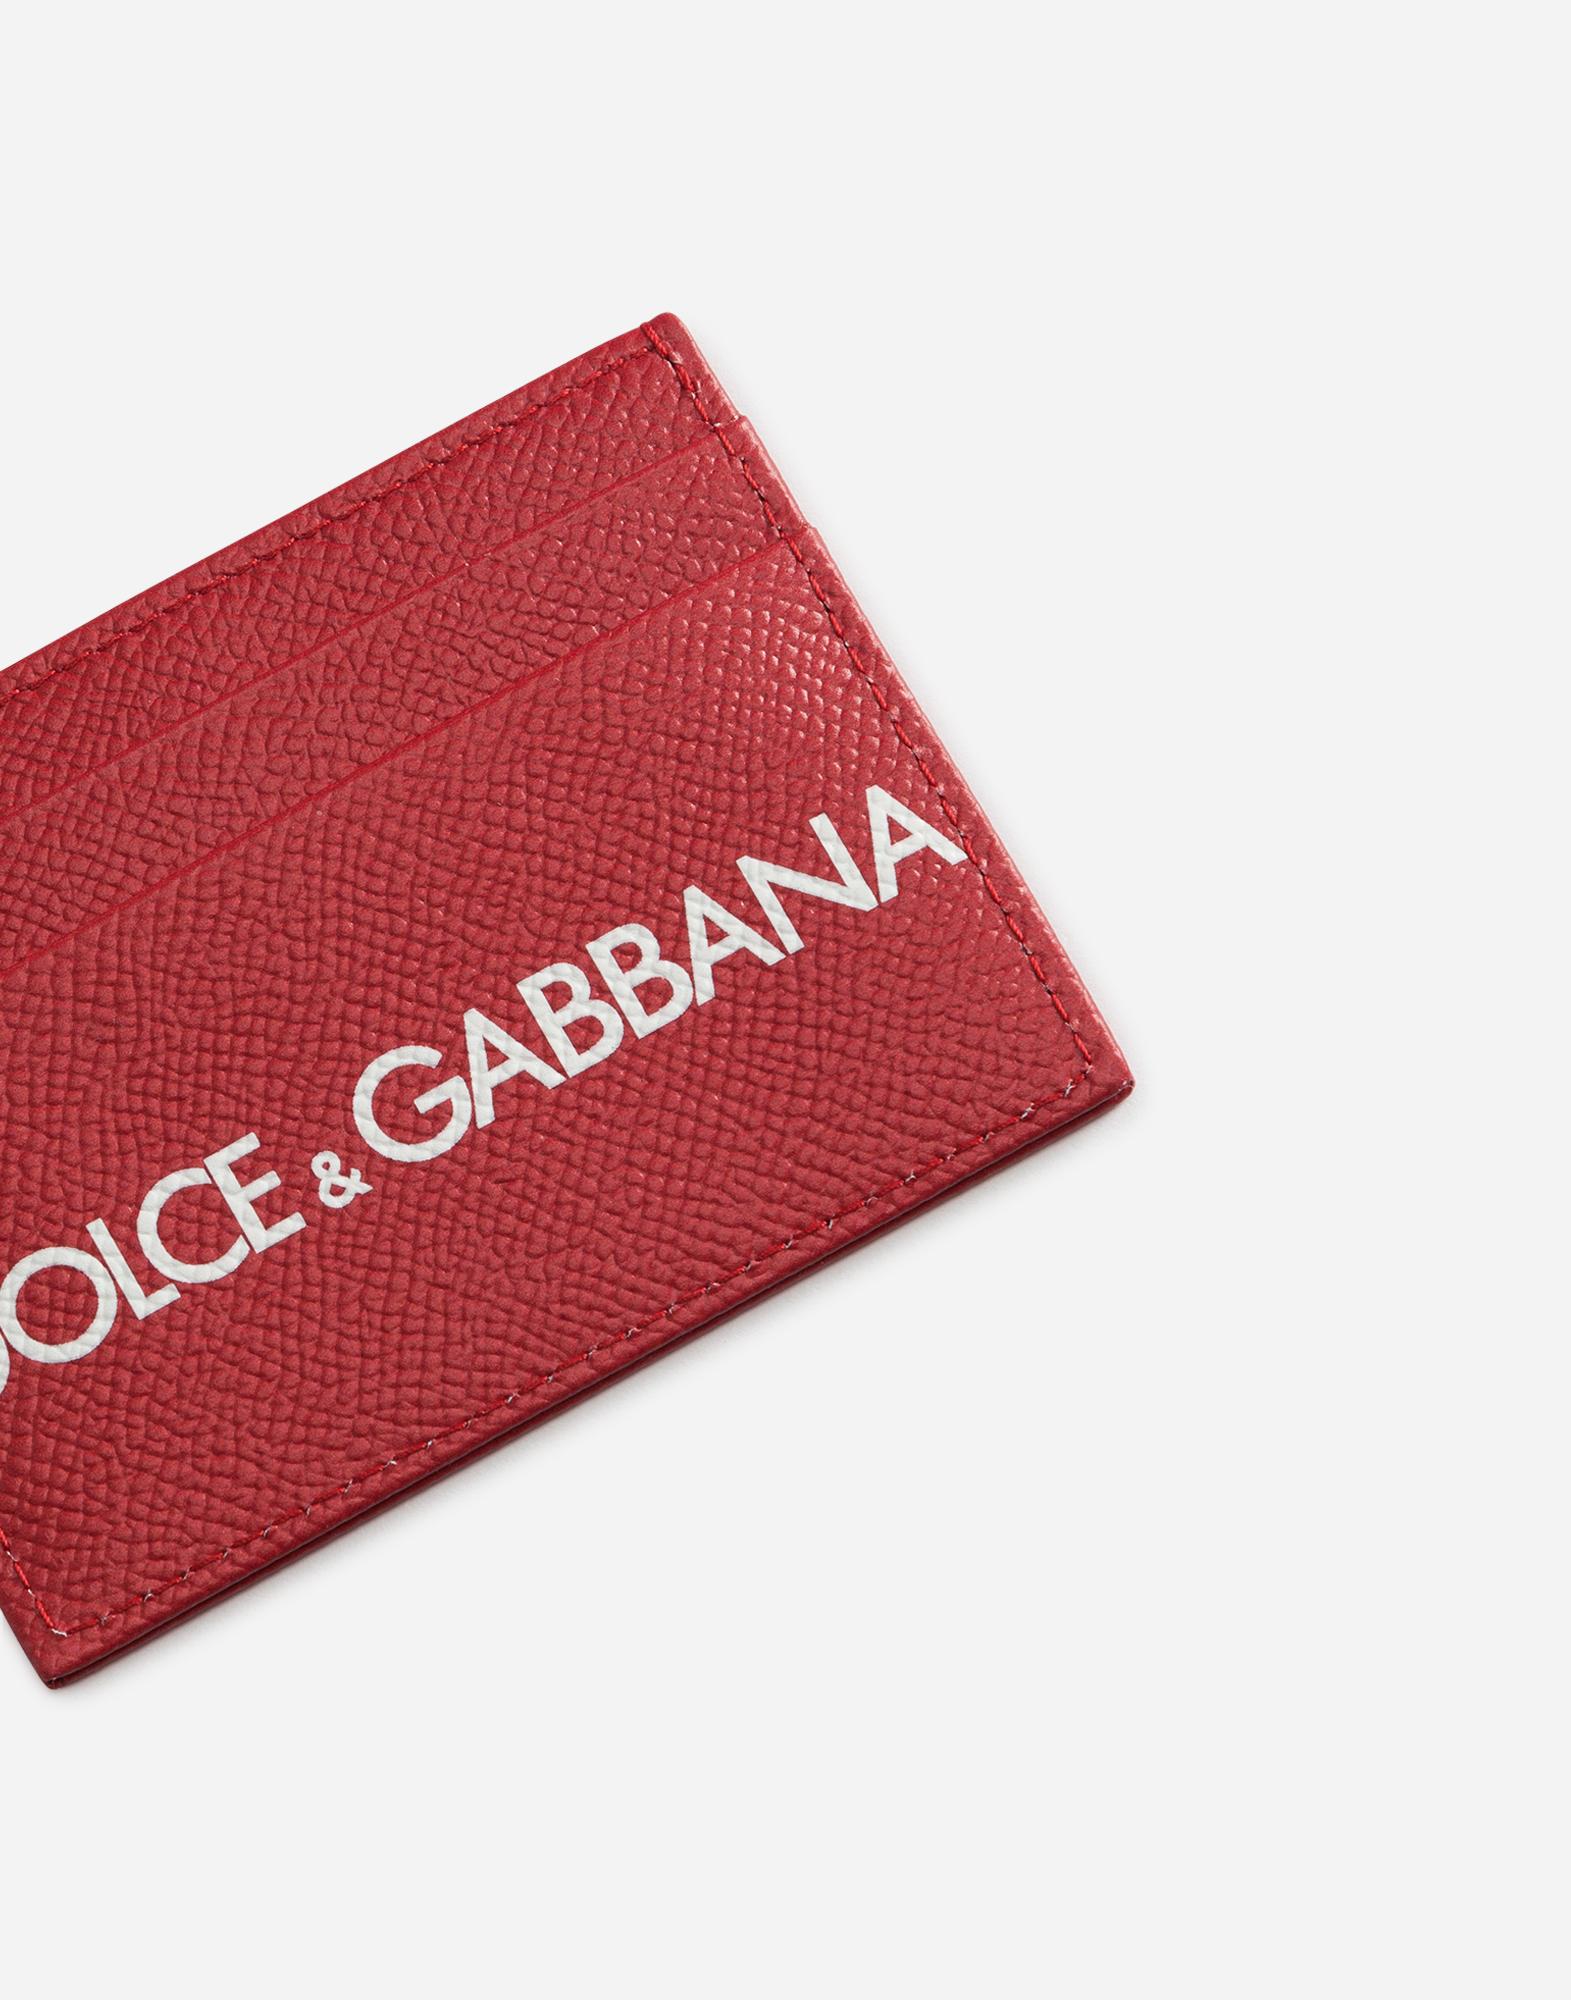 CREDIT CARD HOLDER IN PRINTED DAUPHINE CALFSKIN